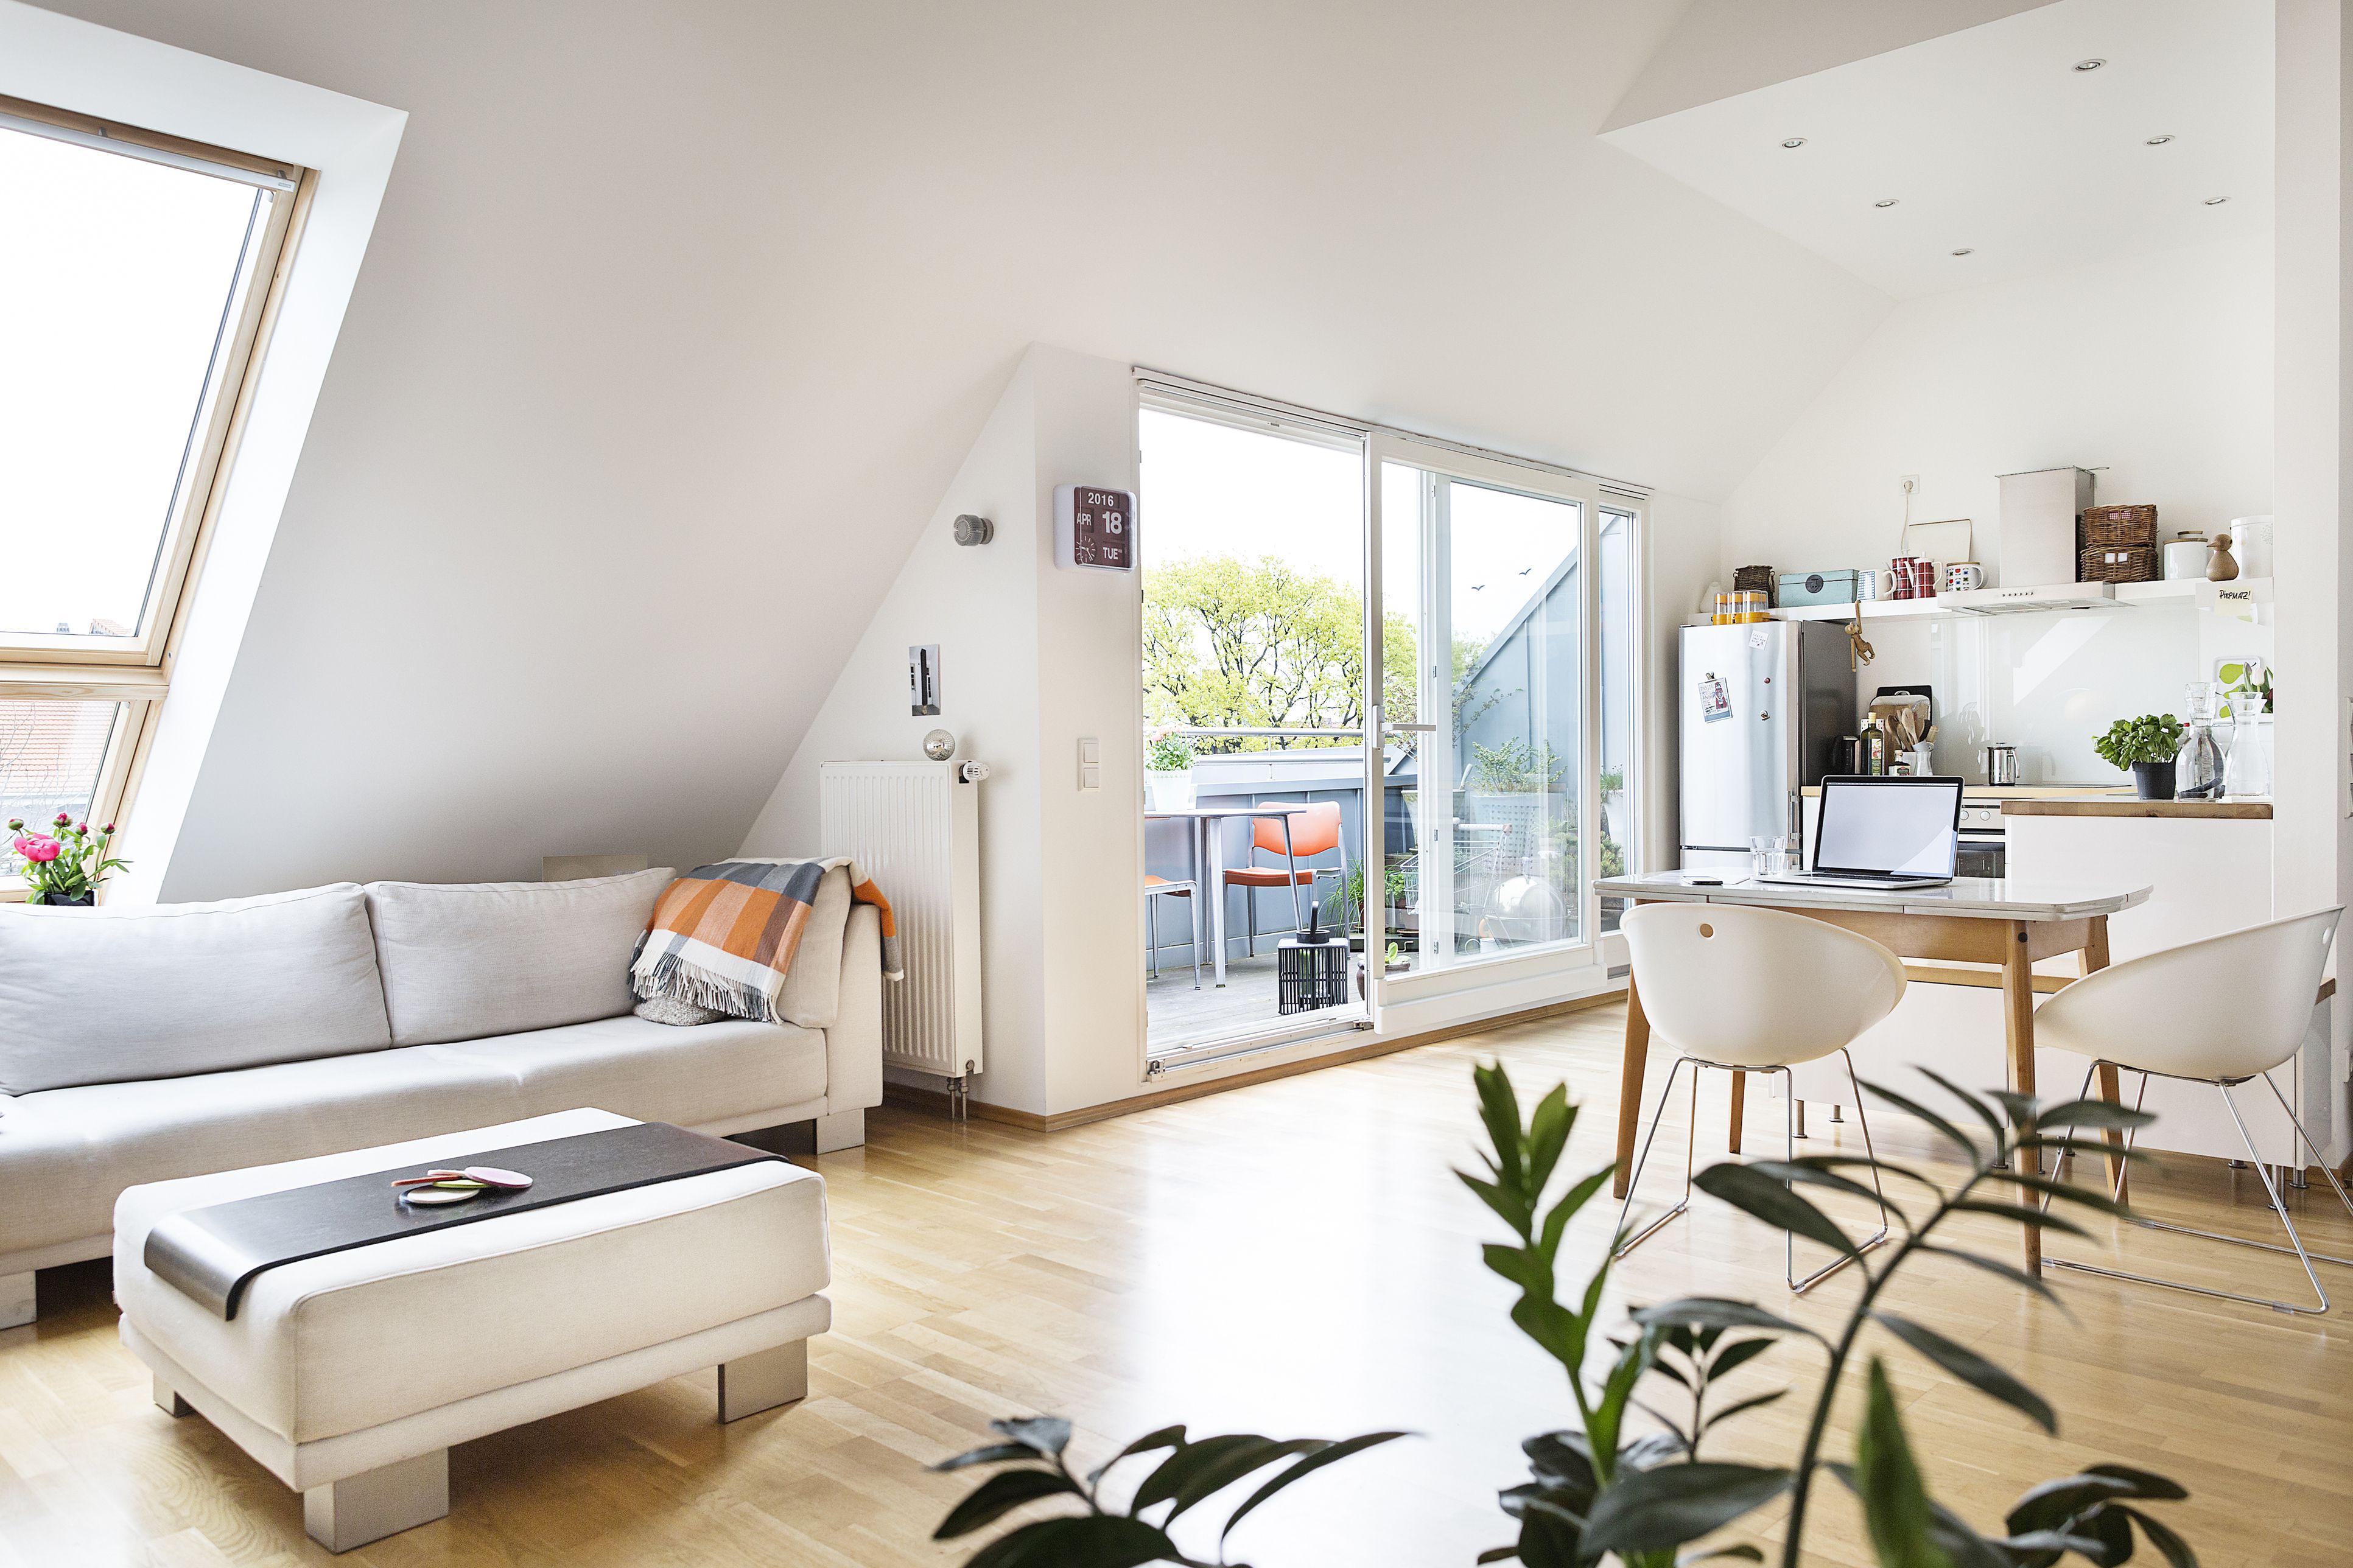 Studio Vs One Bedroom Apartment Renting